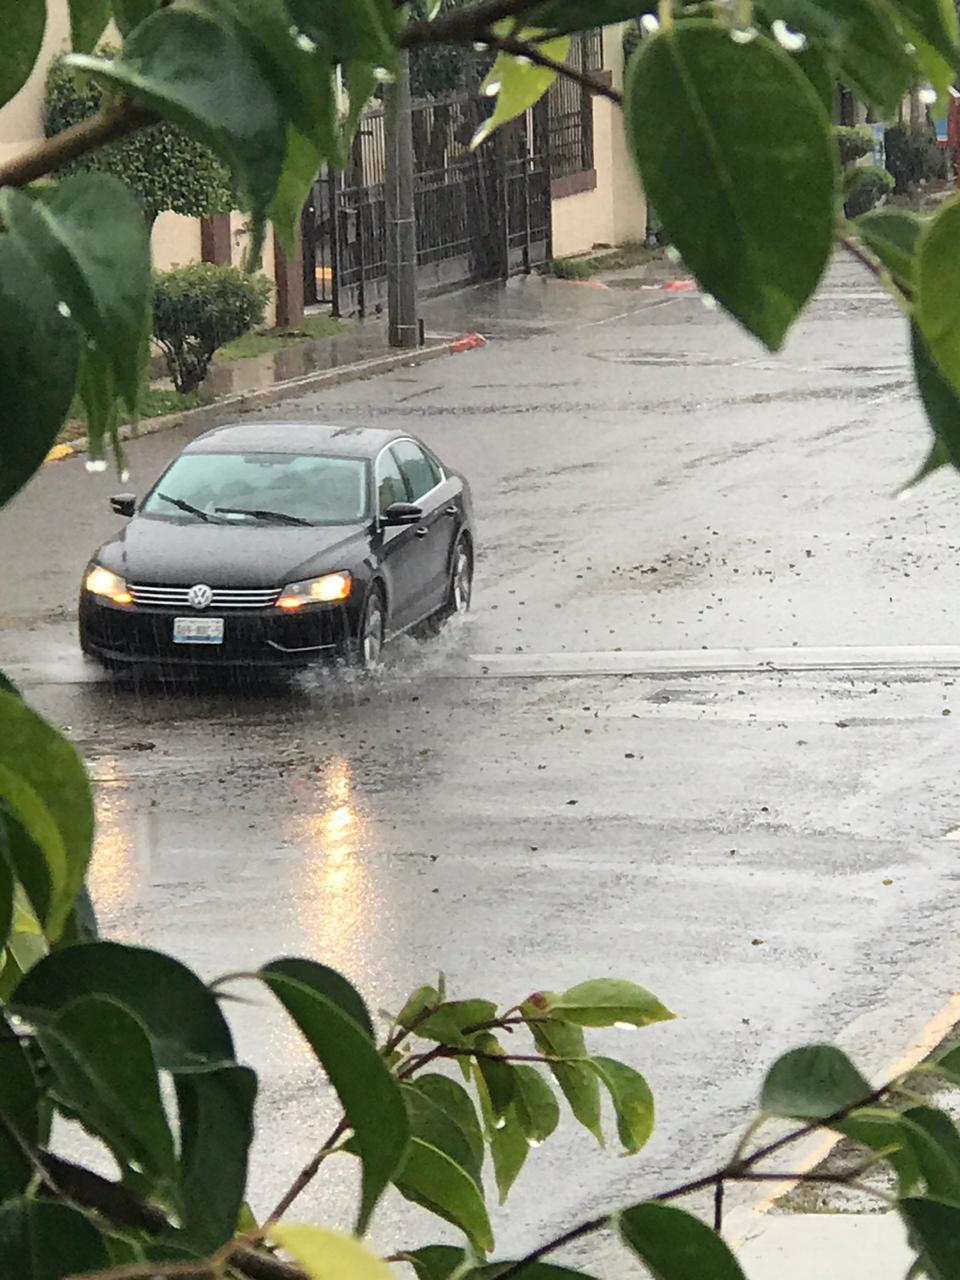 Se esperan lluvias intensas para las próximas horas